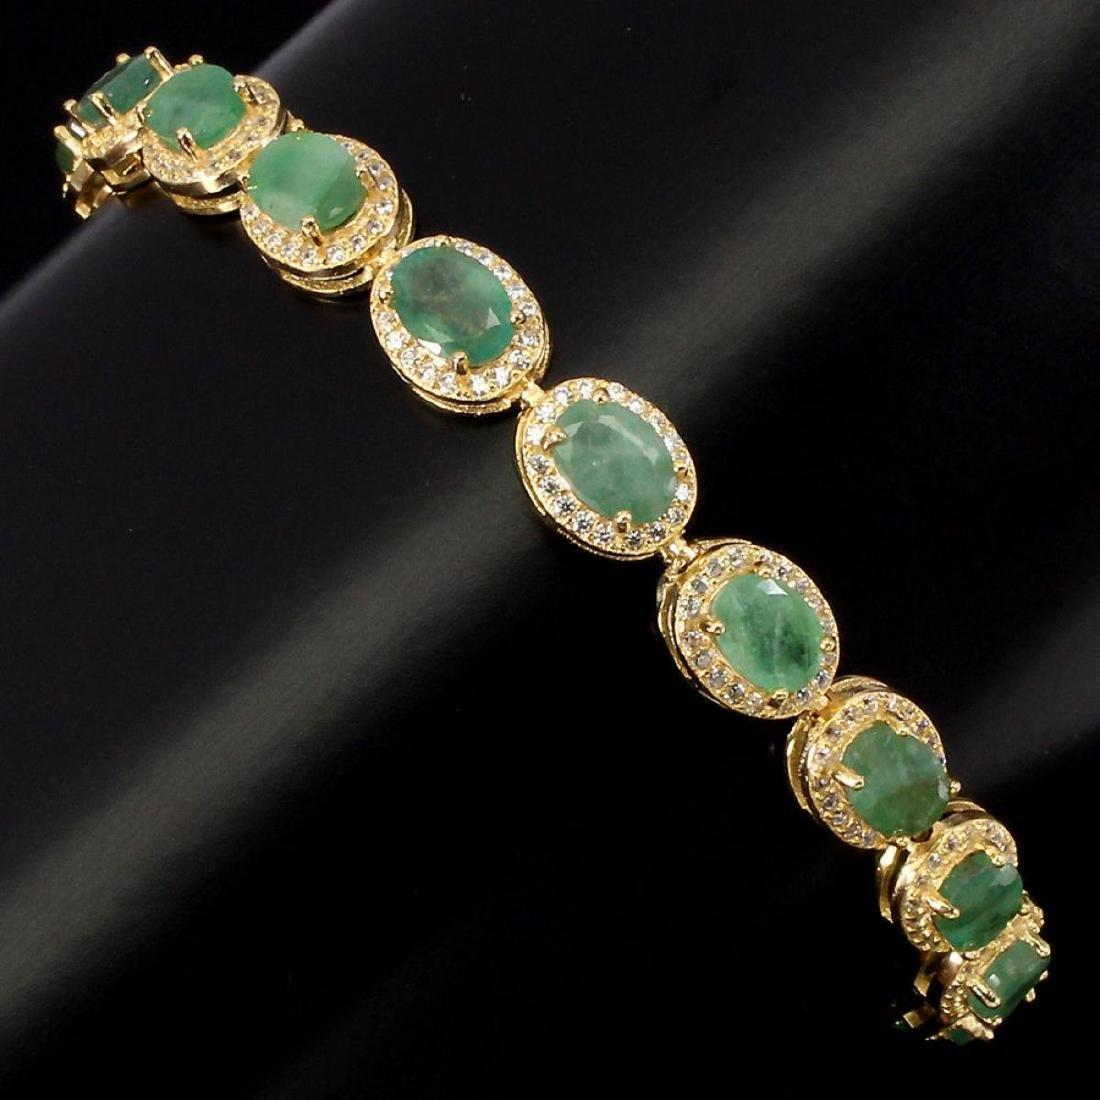 Natural Oval 7x5mm Top Rich Green Emerald Bracelet - 2